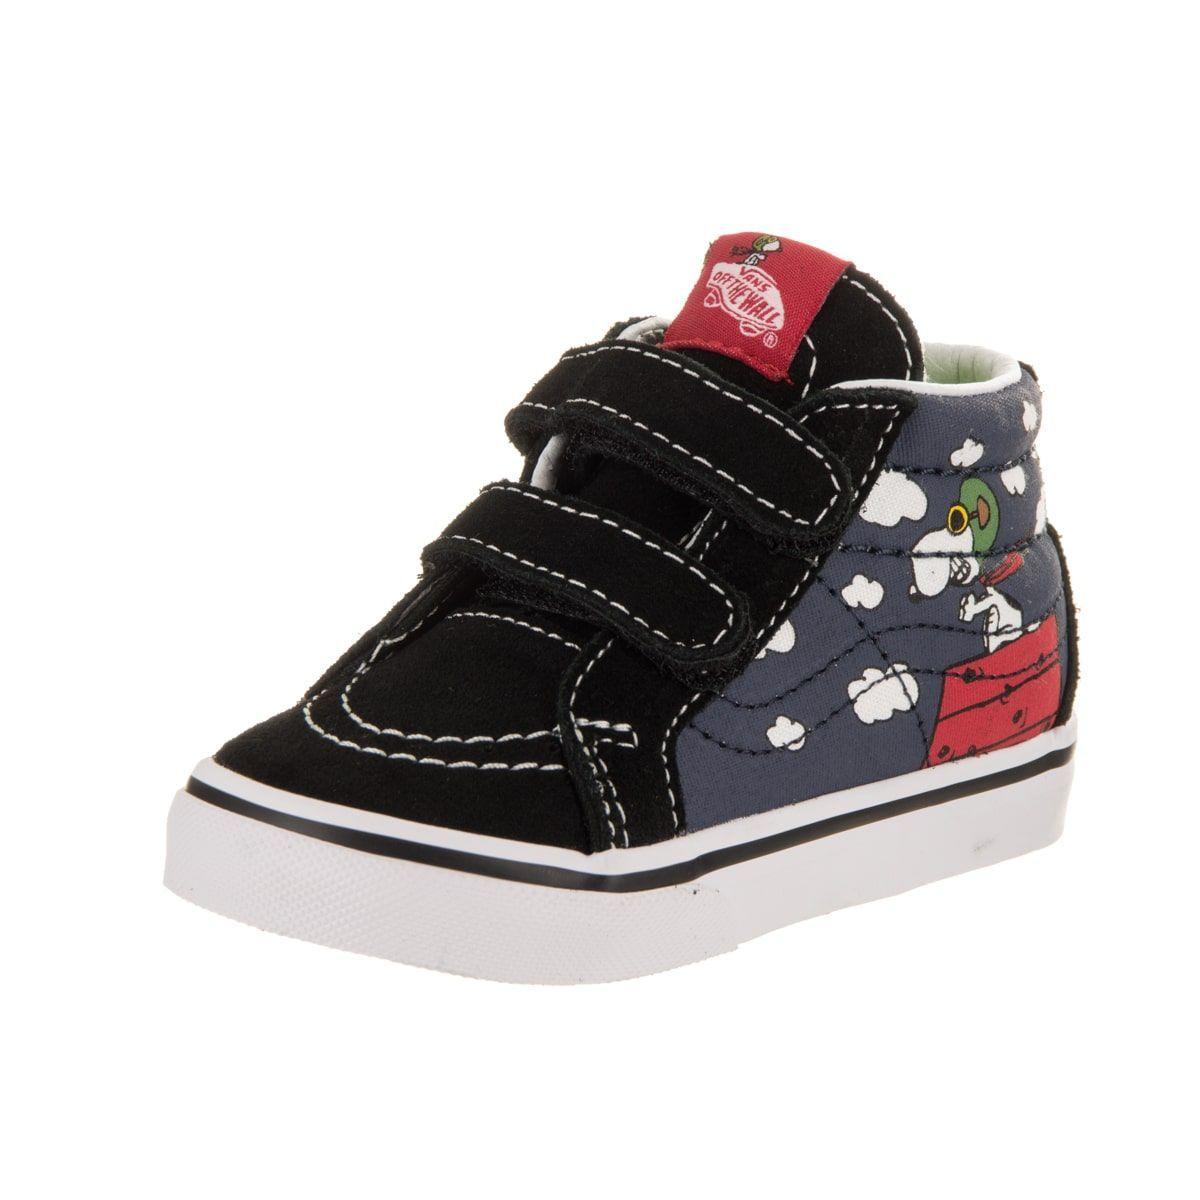 d180861b1c5c25 Vans Infant Reissue V (Peanuts) Skate Shoe